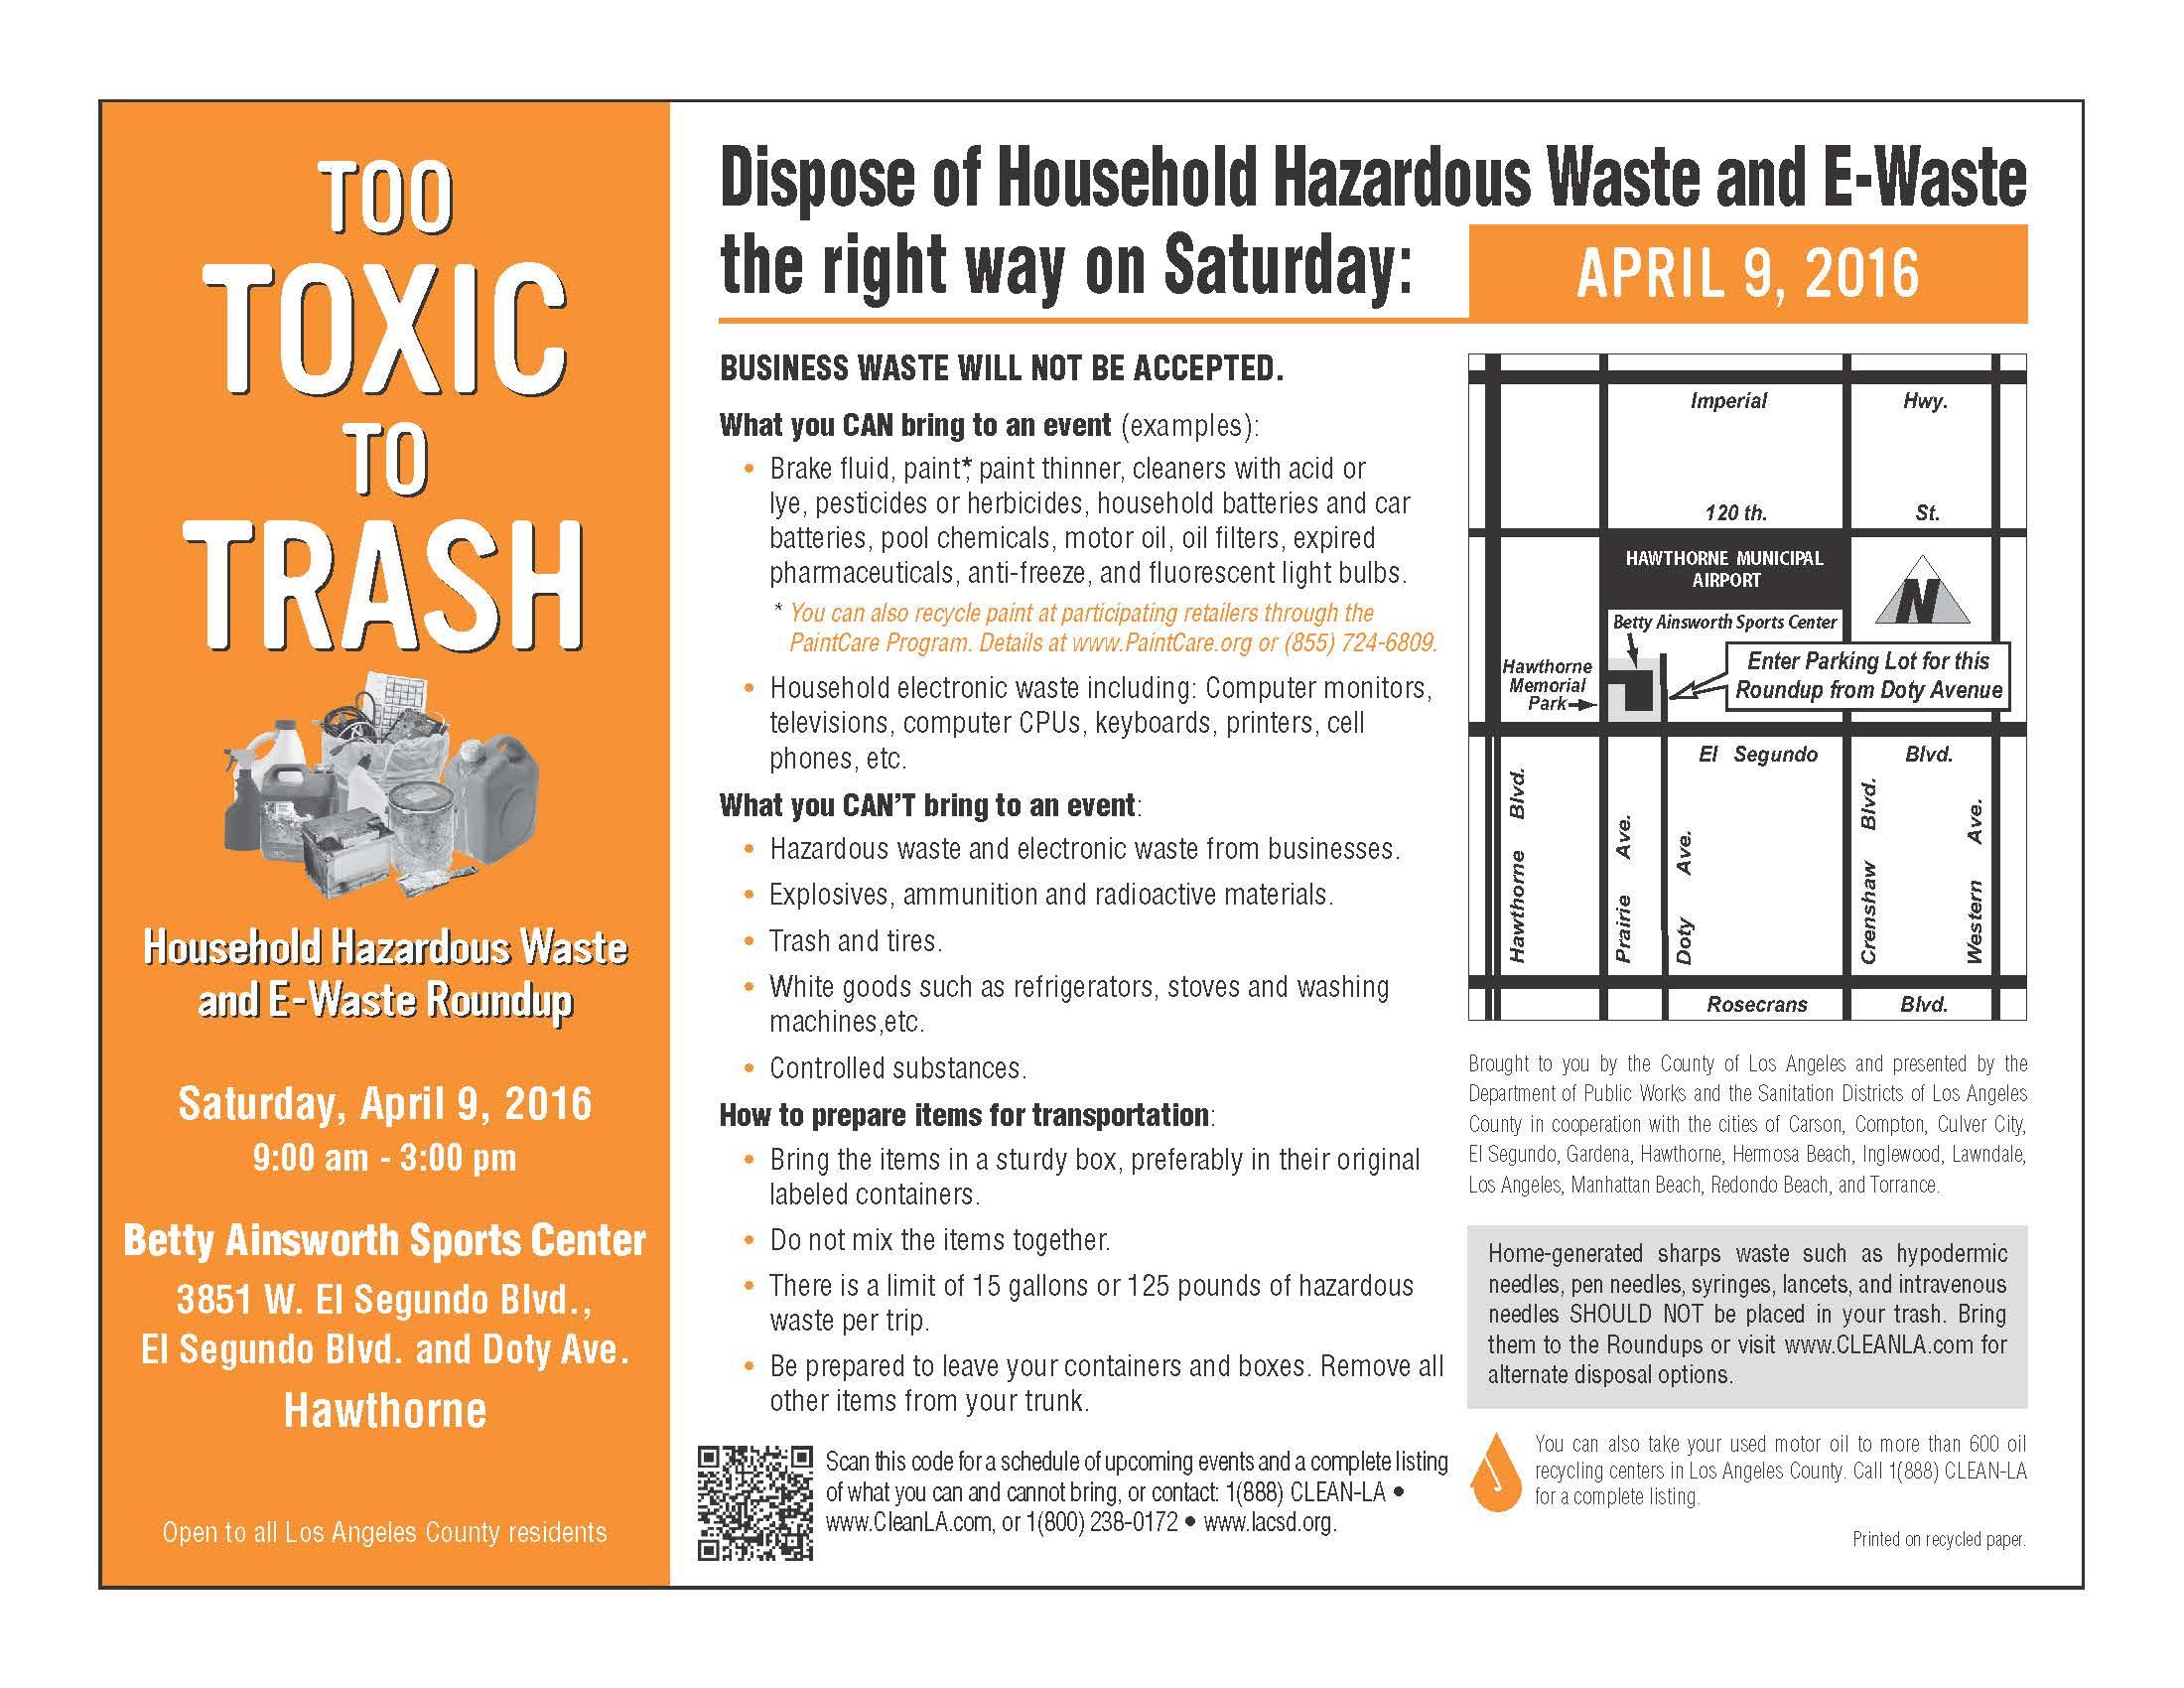 pwks_recy-HHW Flyer2016_Page_1.jpg